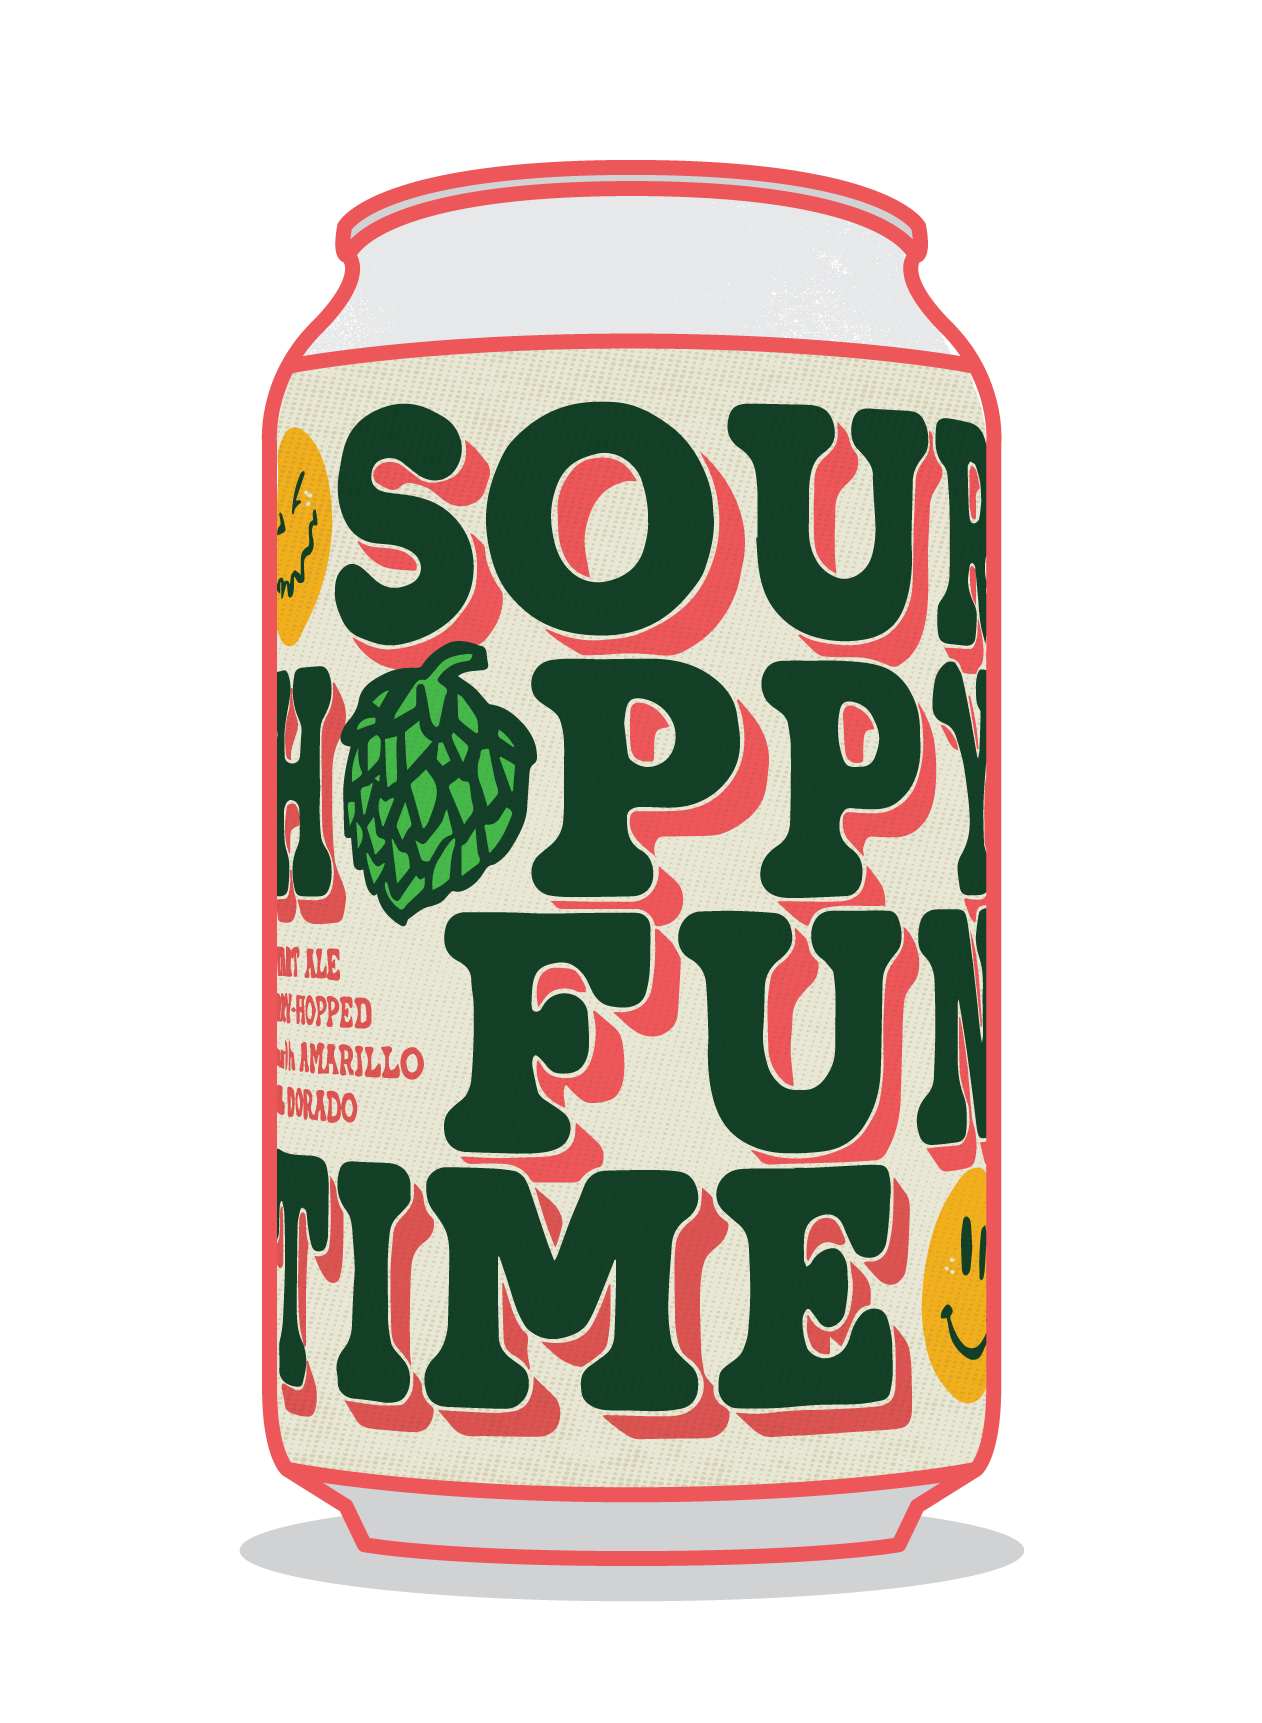 Sour Hoppy Fun Time Image